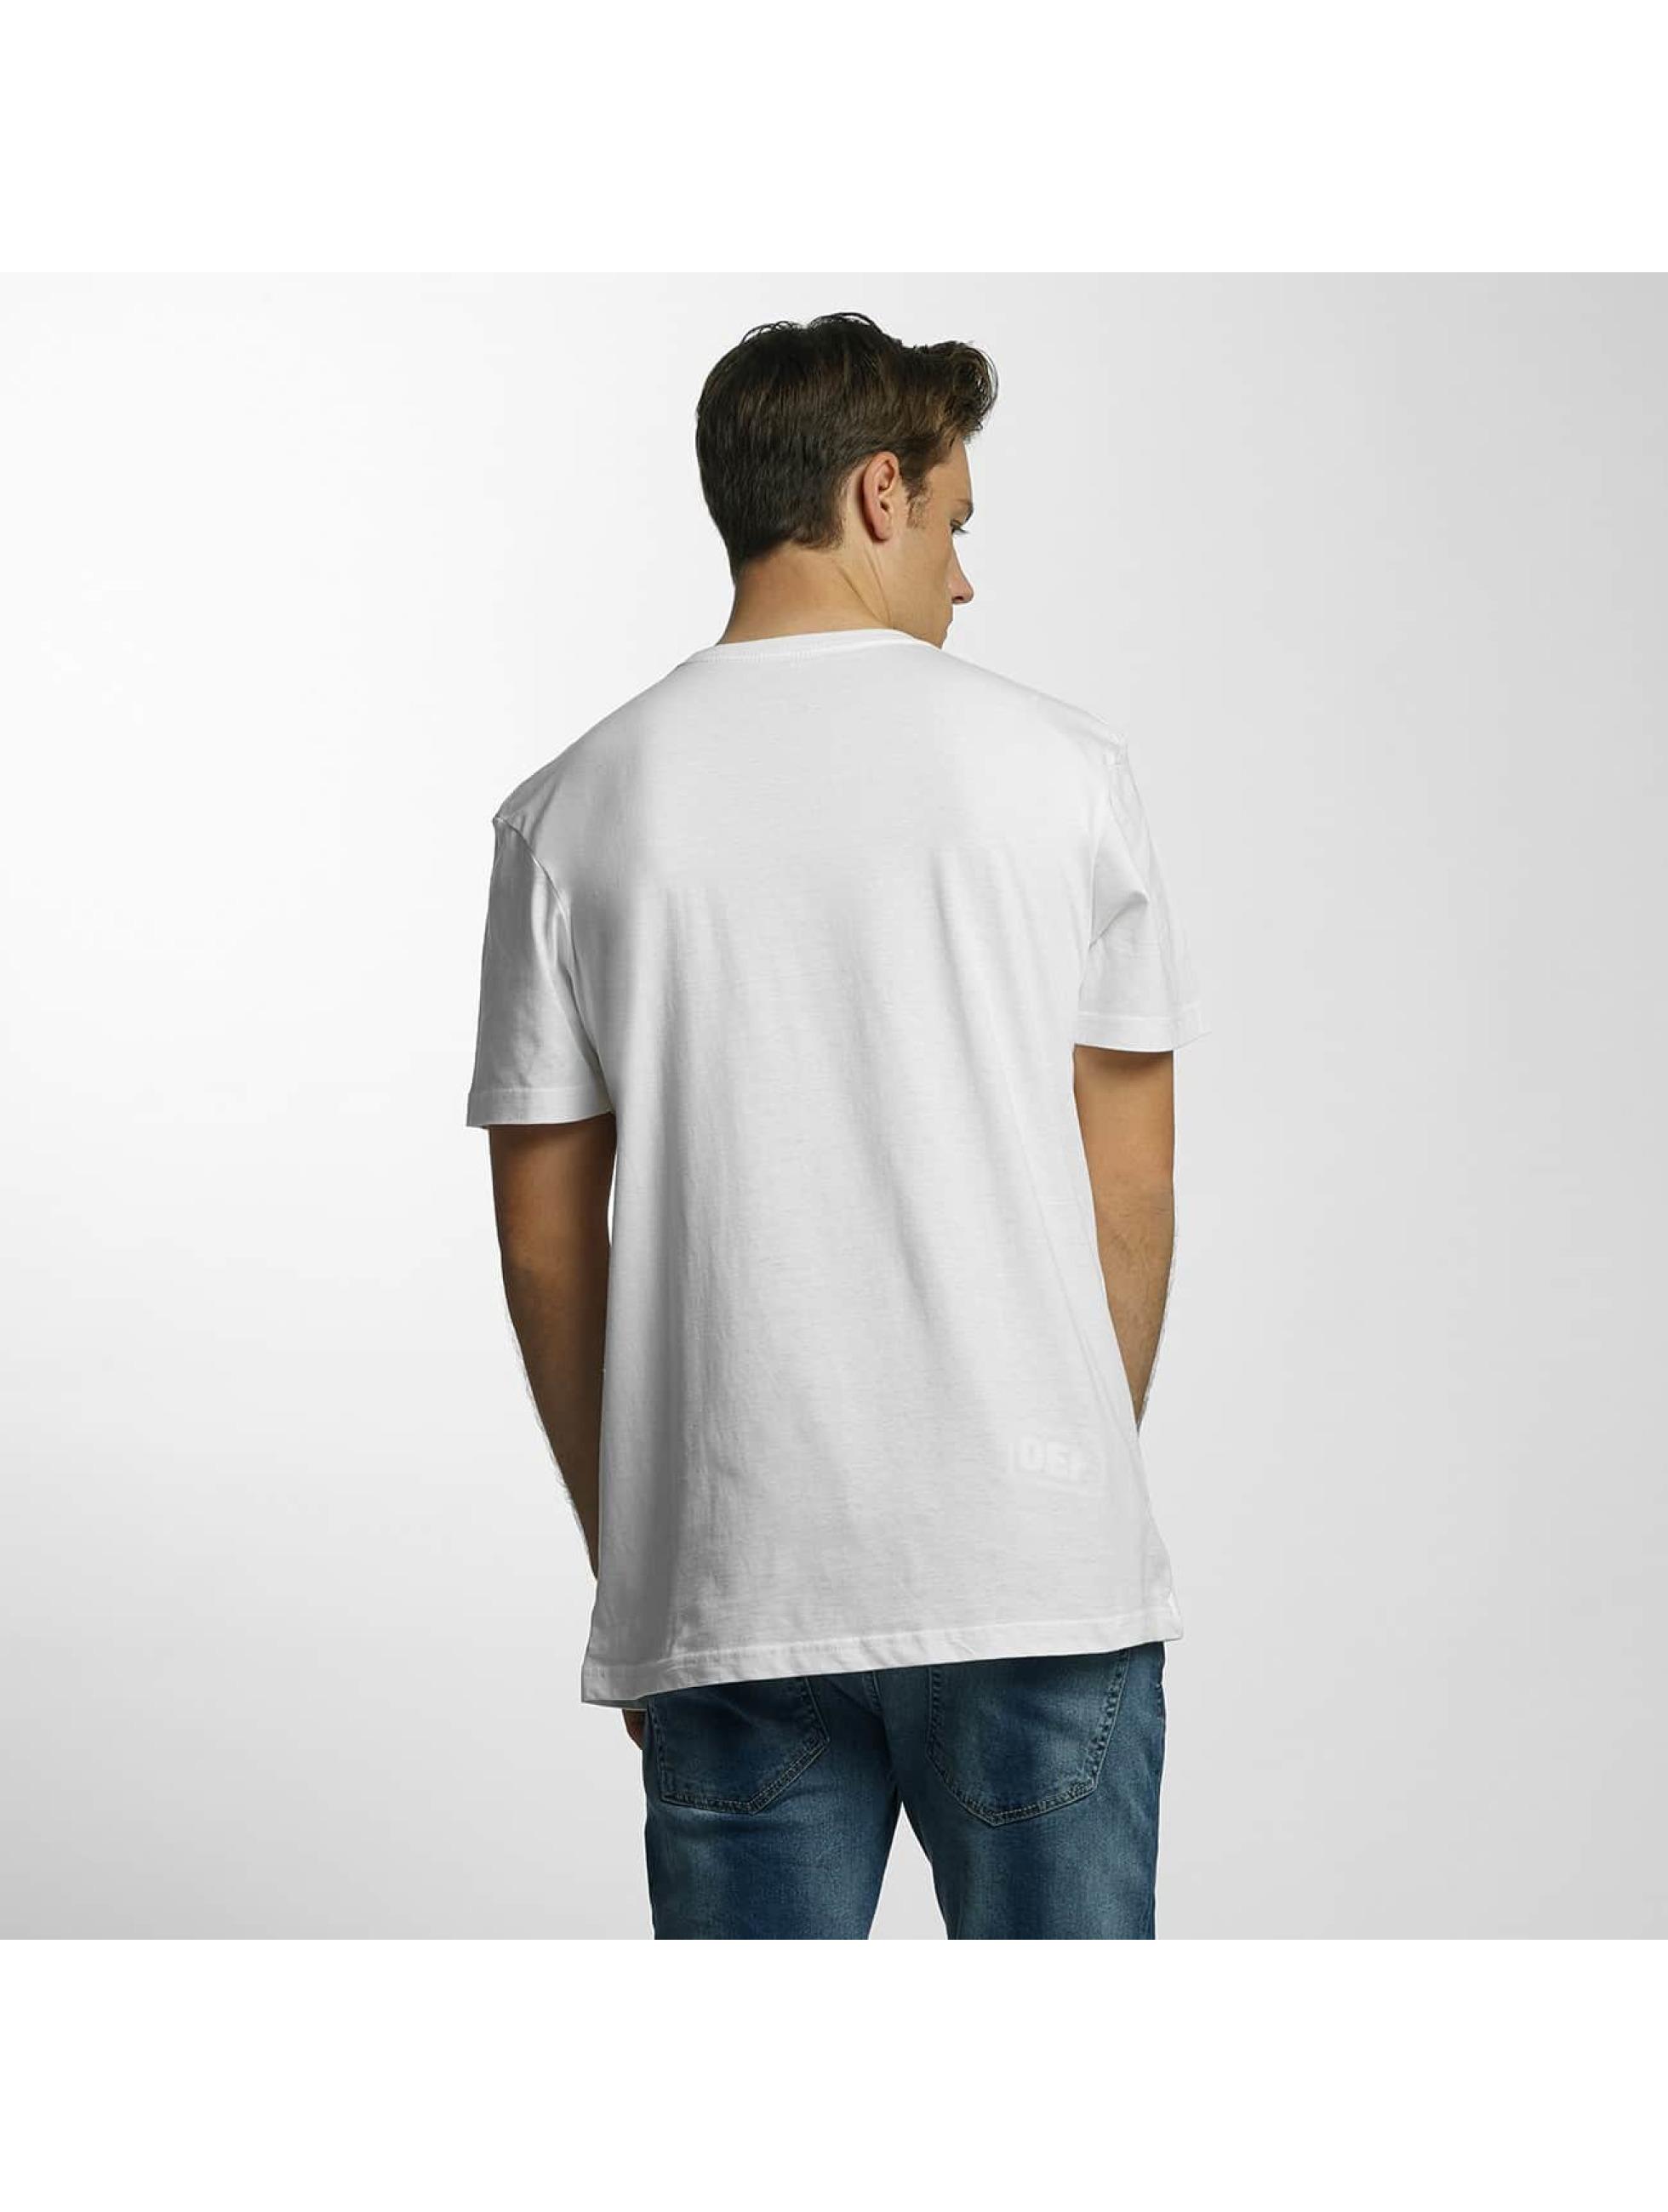 Quiksilver T-Shirt Classic Comfort Place weiß